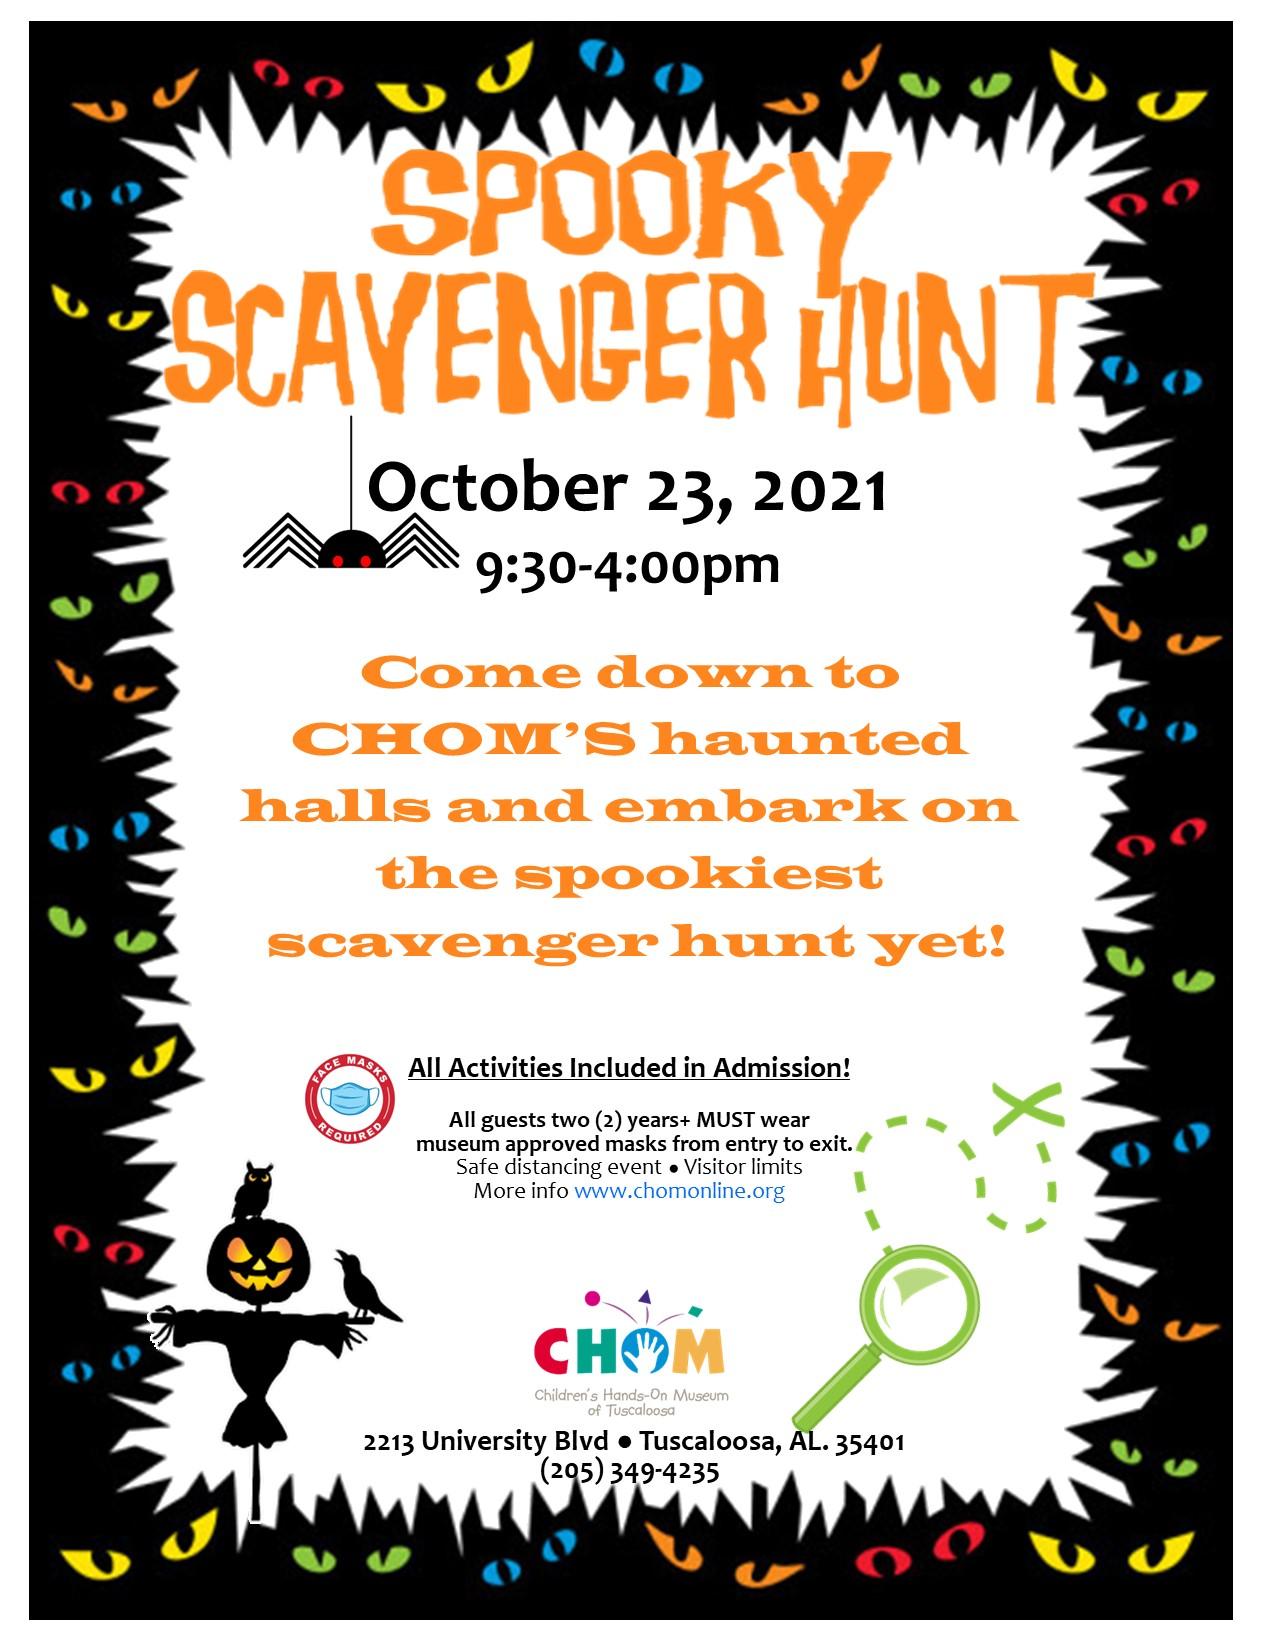 Spooky Scavenger Hunt at CHOM!